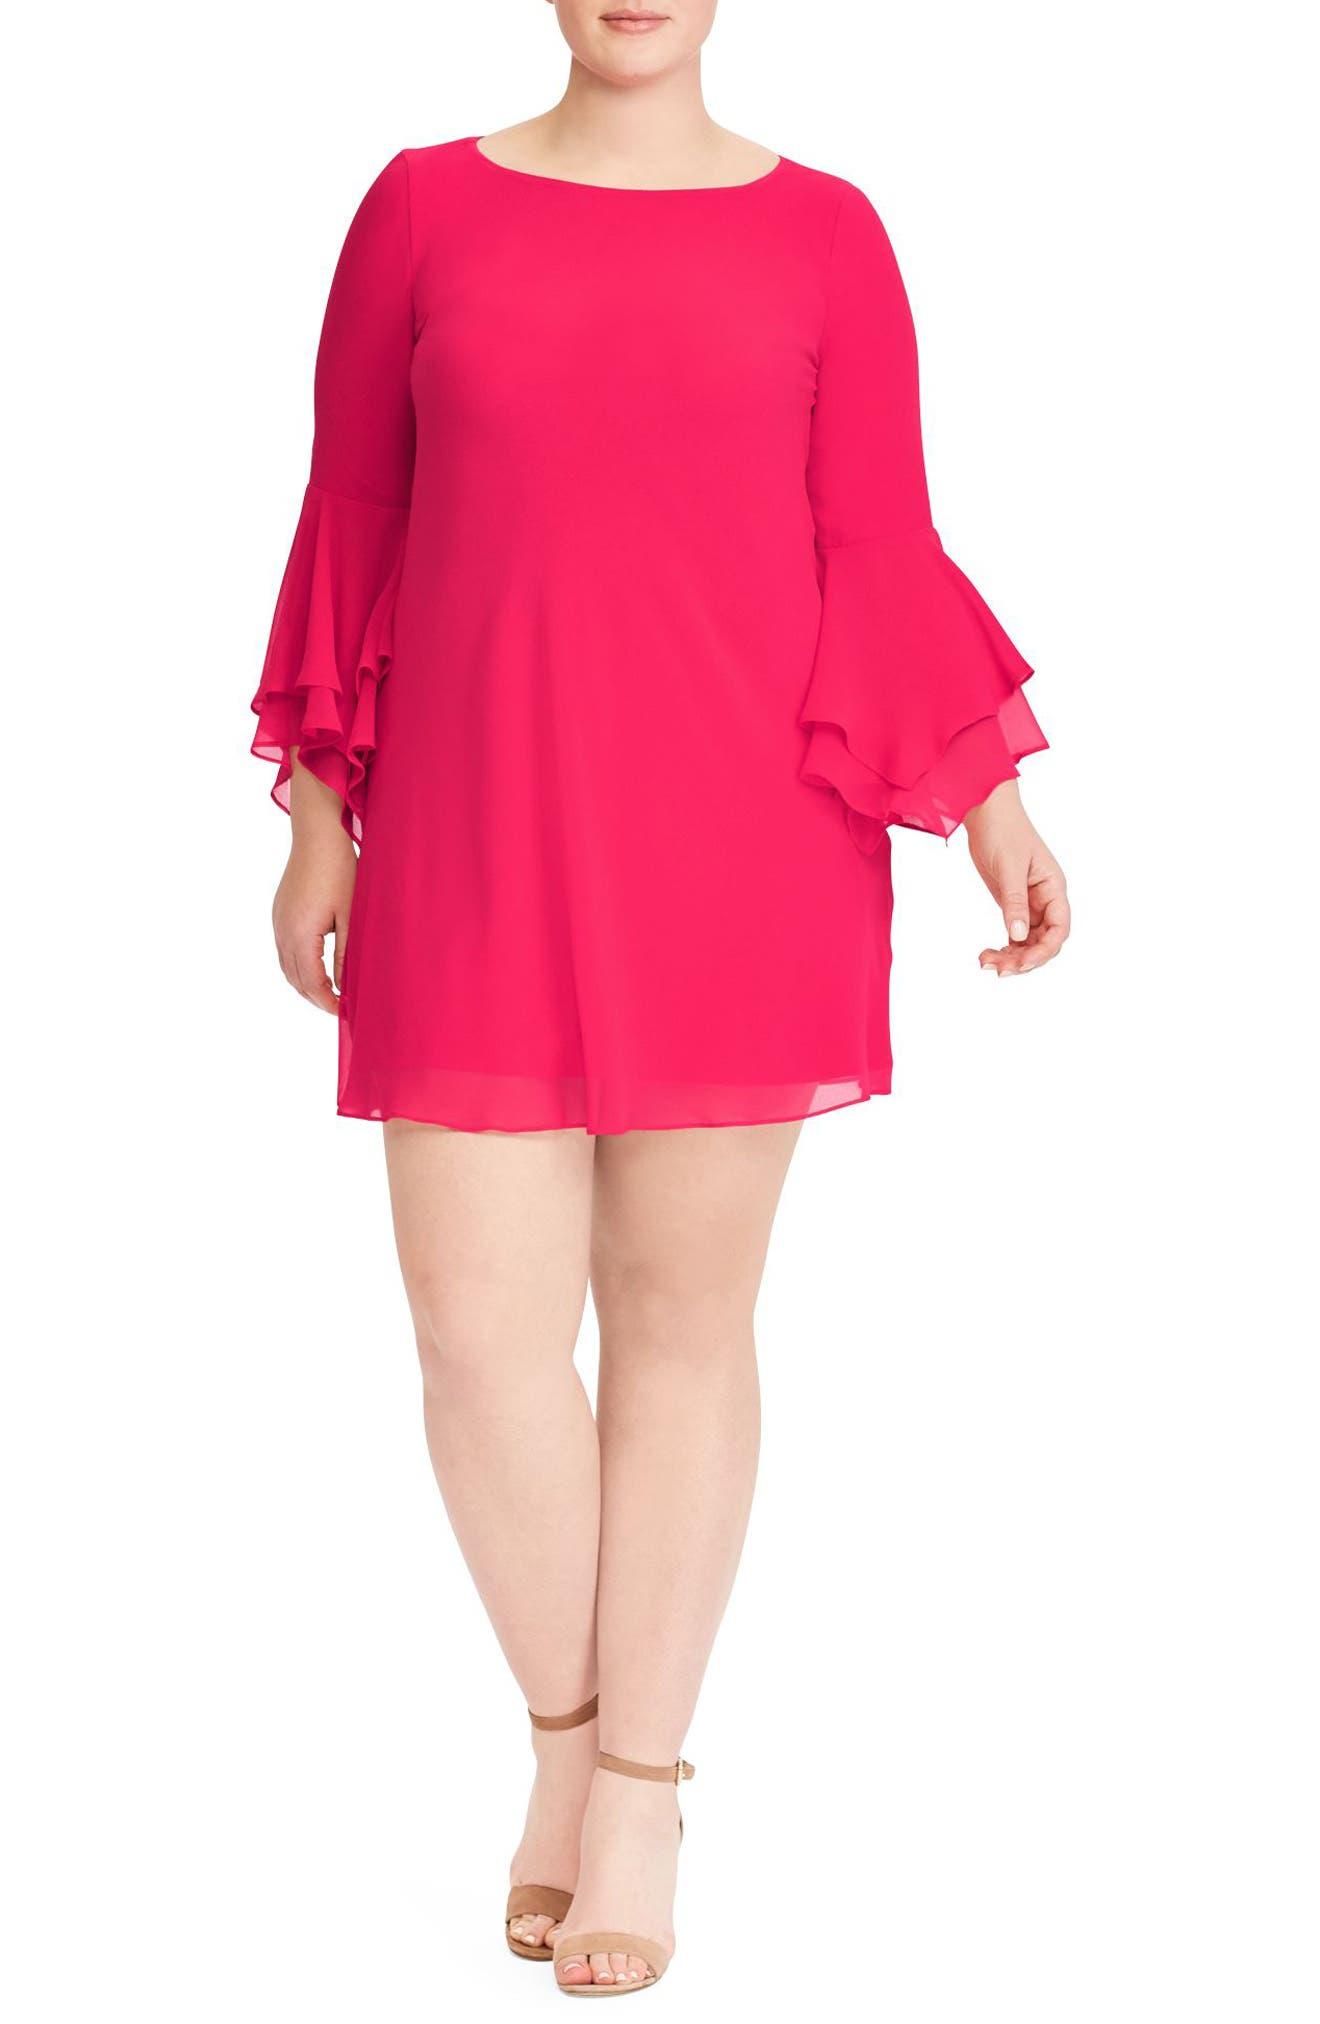 Lauren Ralph Lauren Beata Handkerchief Sleeve Minidress (Plus Size)